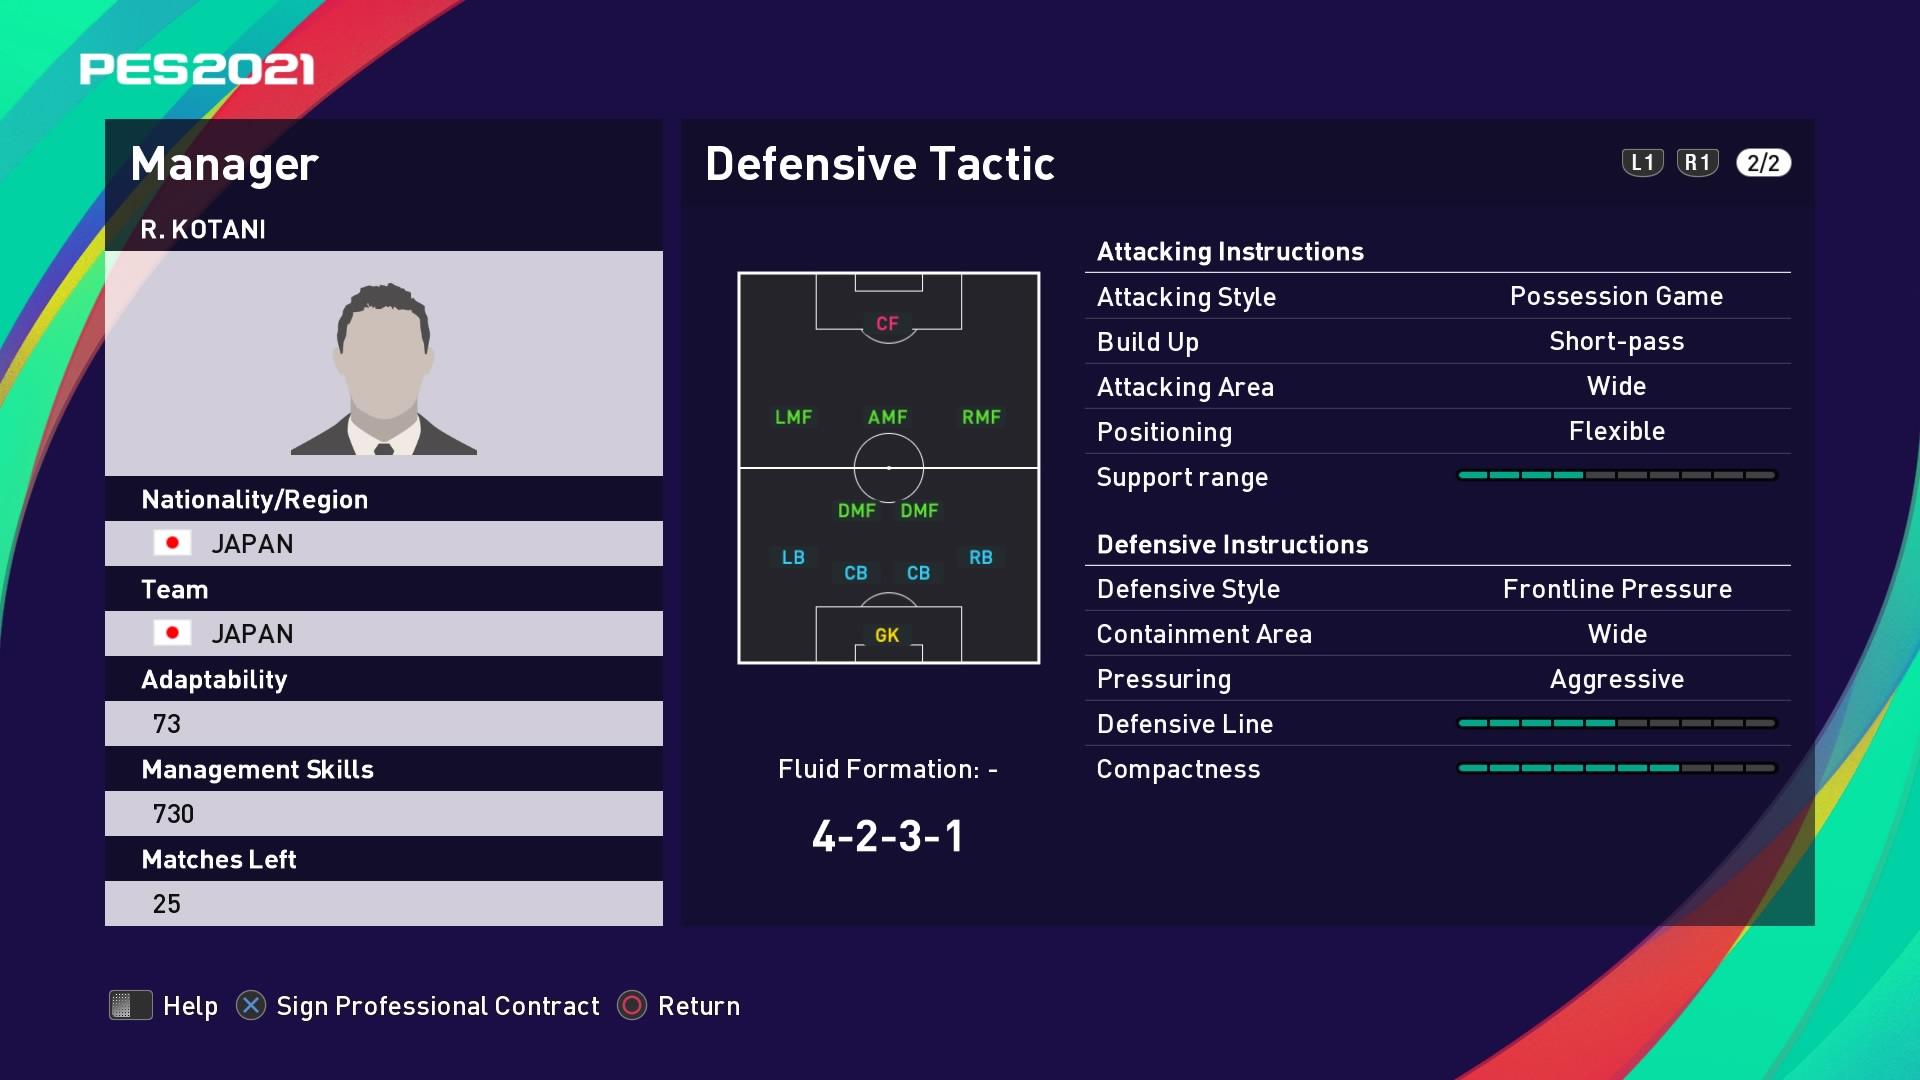 R. Kotani (Hajime Moriyasu) Defensive Tactic in PES 2021 myClub